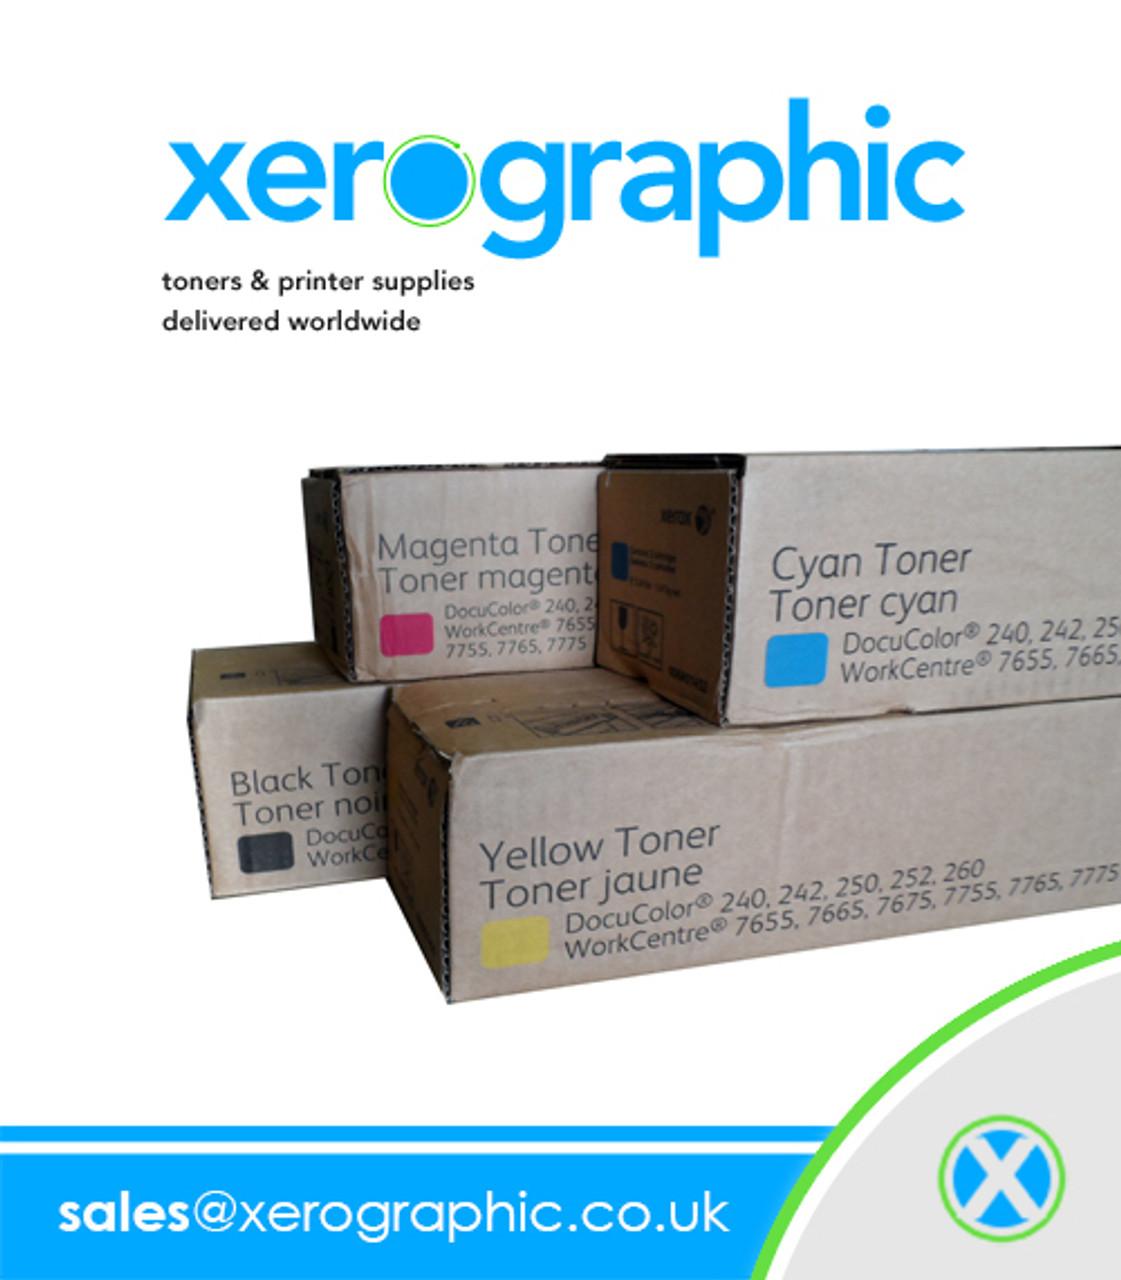 Xerox DC 240 Docucolor 240 250 242 252 260 CMYK Toner Set